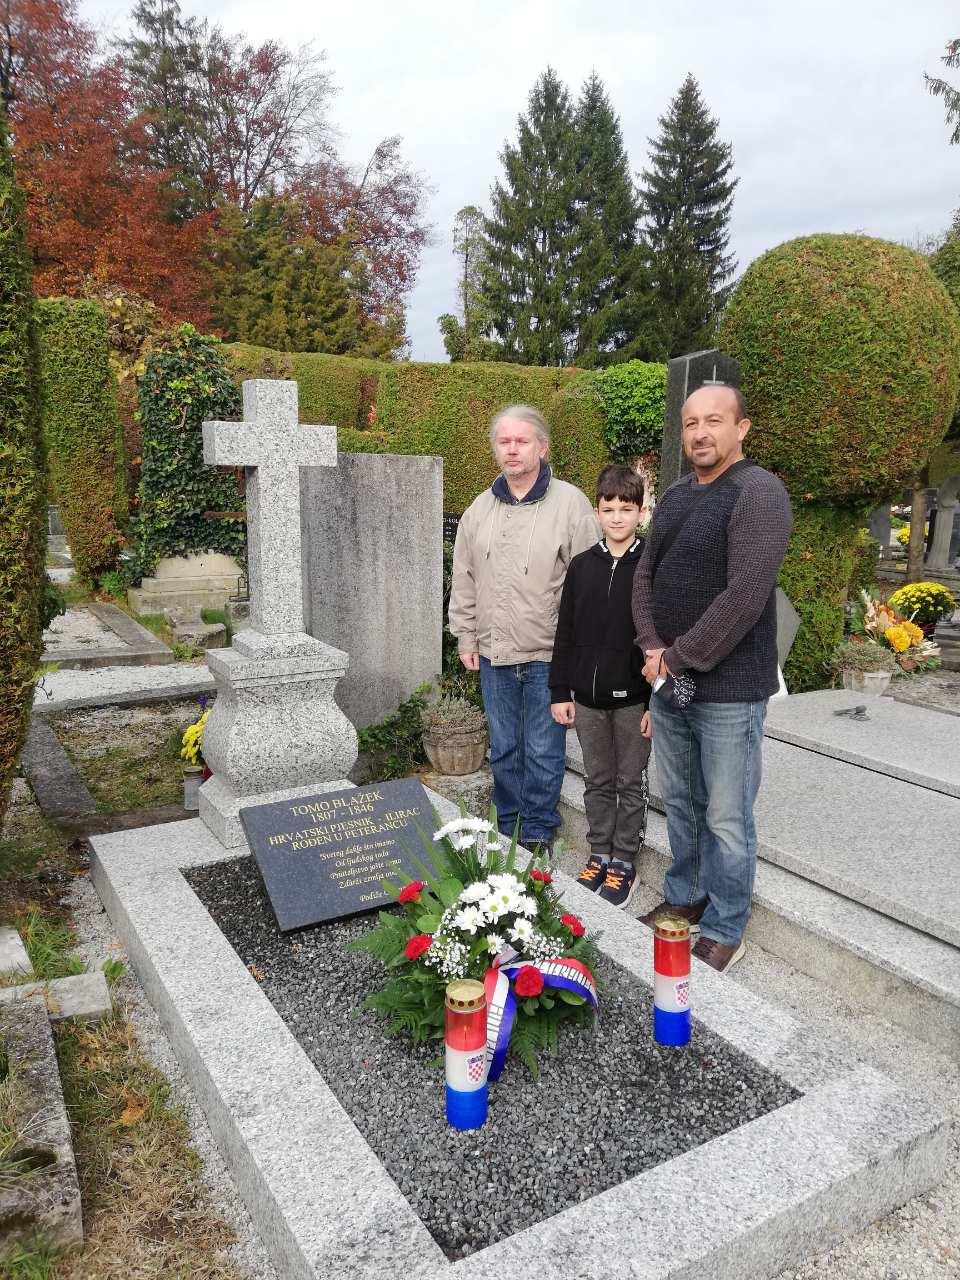 Općina Peteranec obnovila spomenik Tome Blažeka